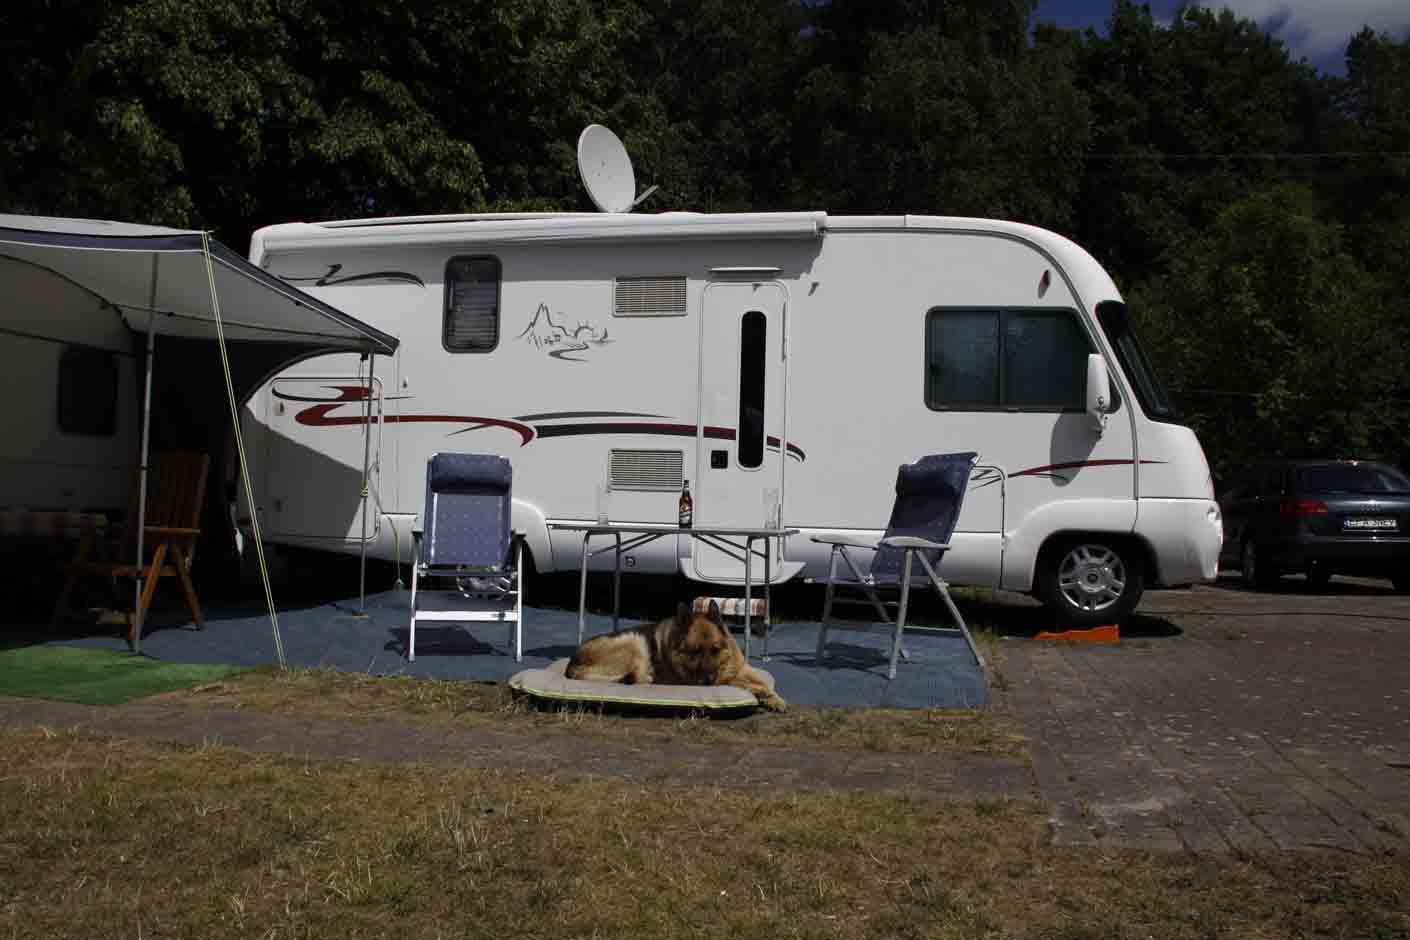 campingplatz KEJA Pustkowo Preise